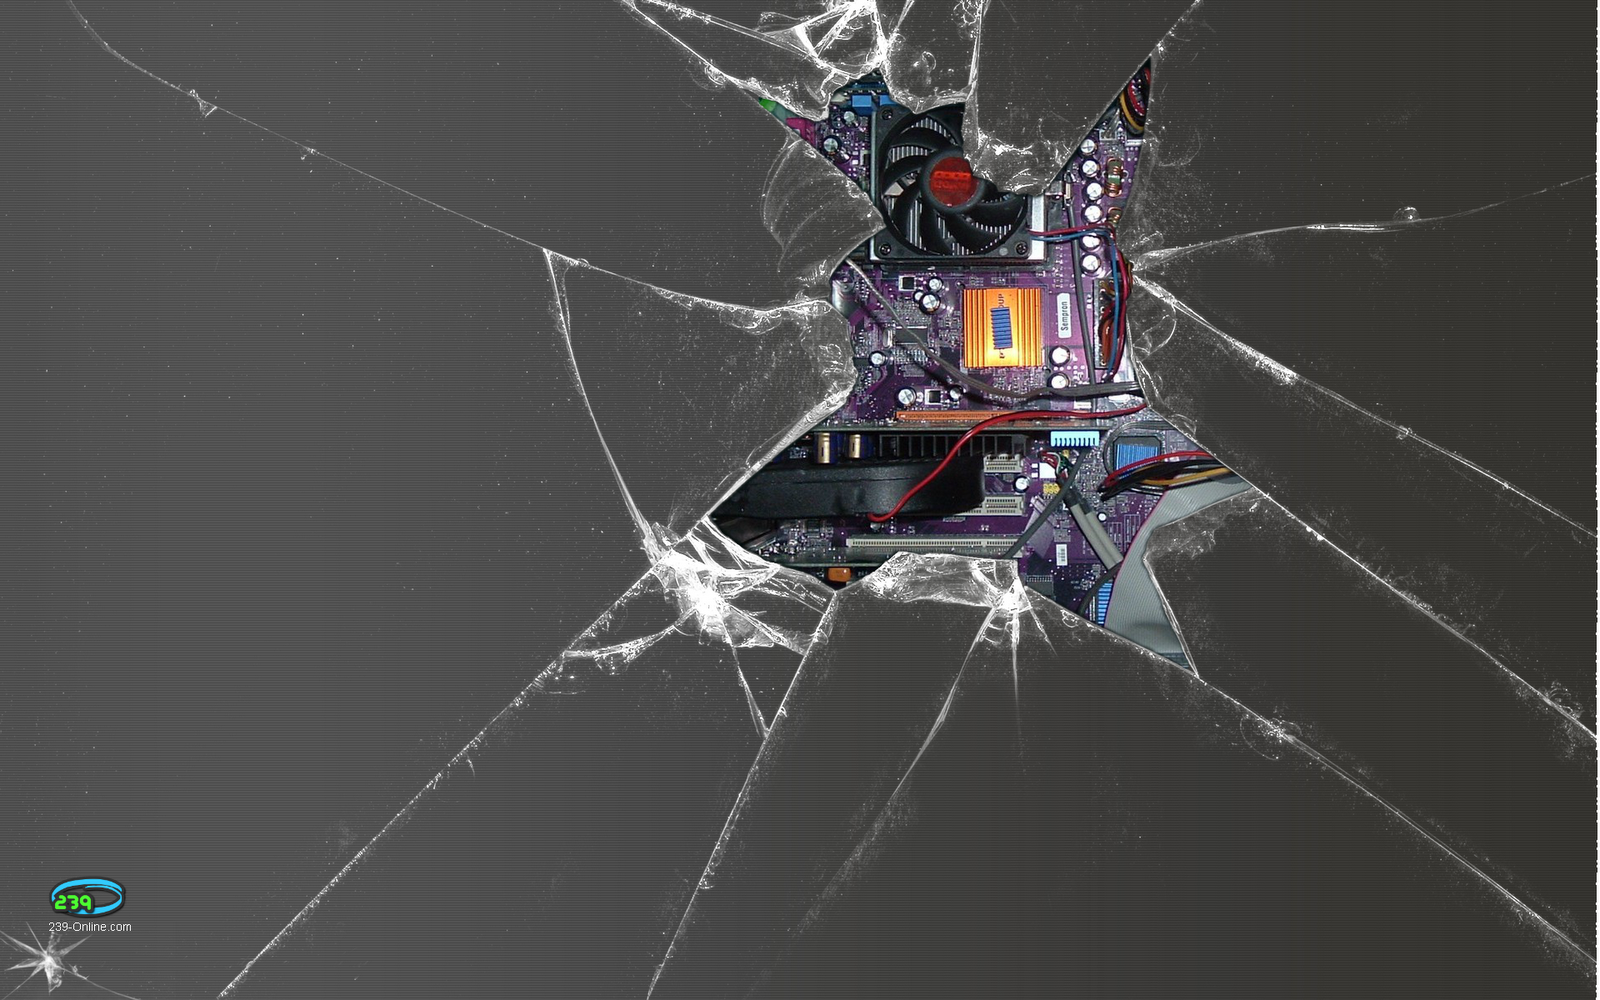 Hd broken screen wallpaper wallpapersafari broken phone screen wallpaper hd wallpaper broken screen 1600x1000 voltagebd Images